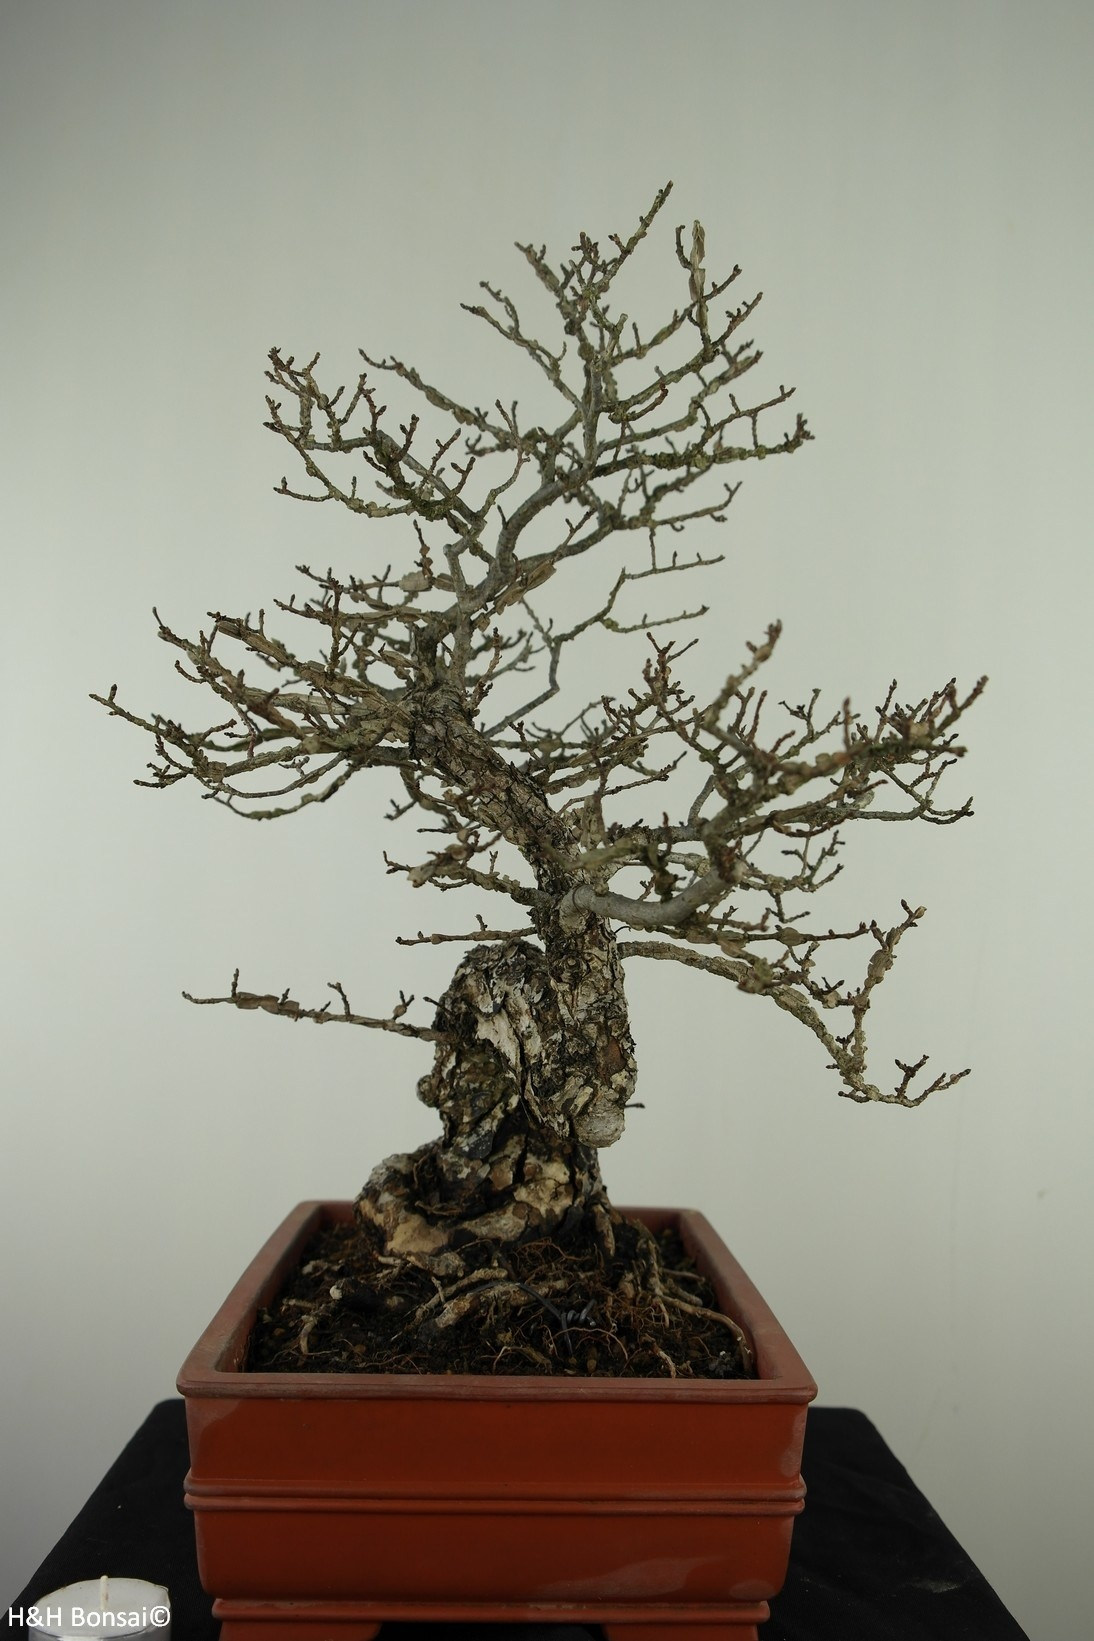 Bonsai Fusain ailé, Euonymus alatus, no. 7514